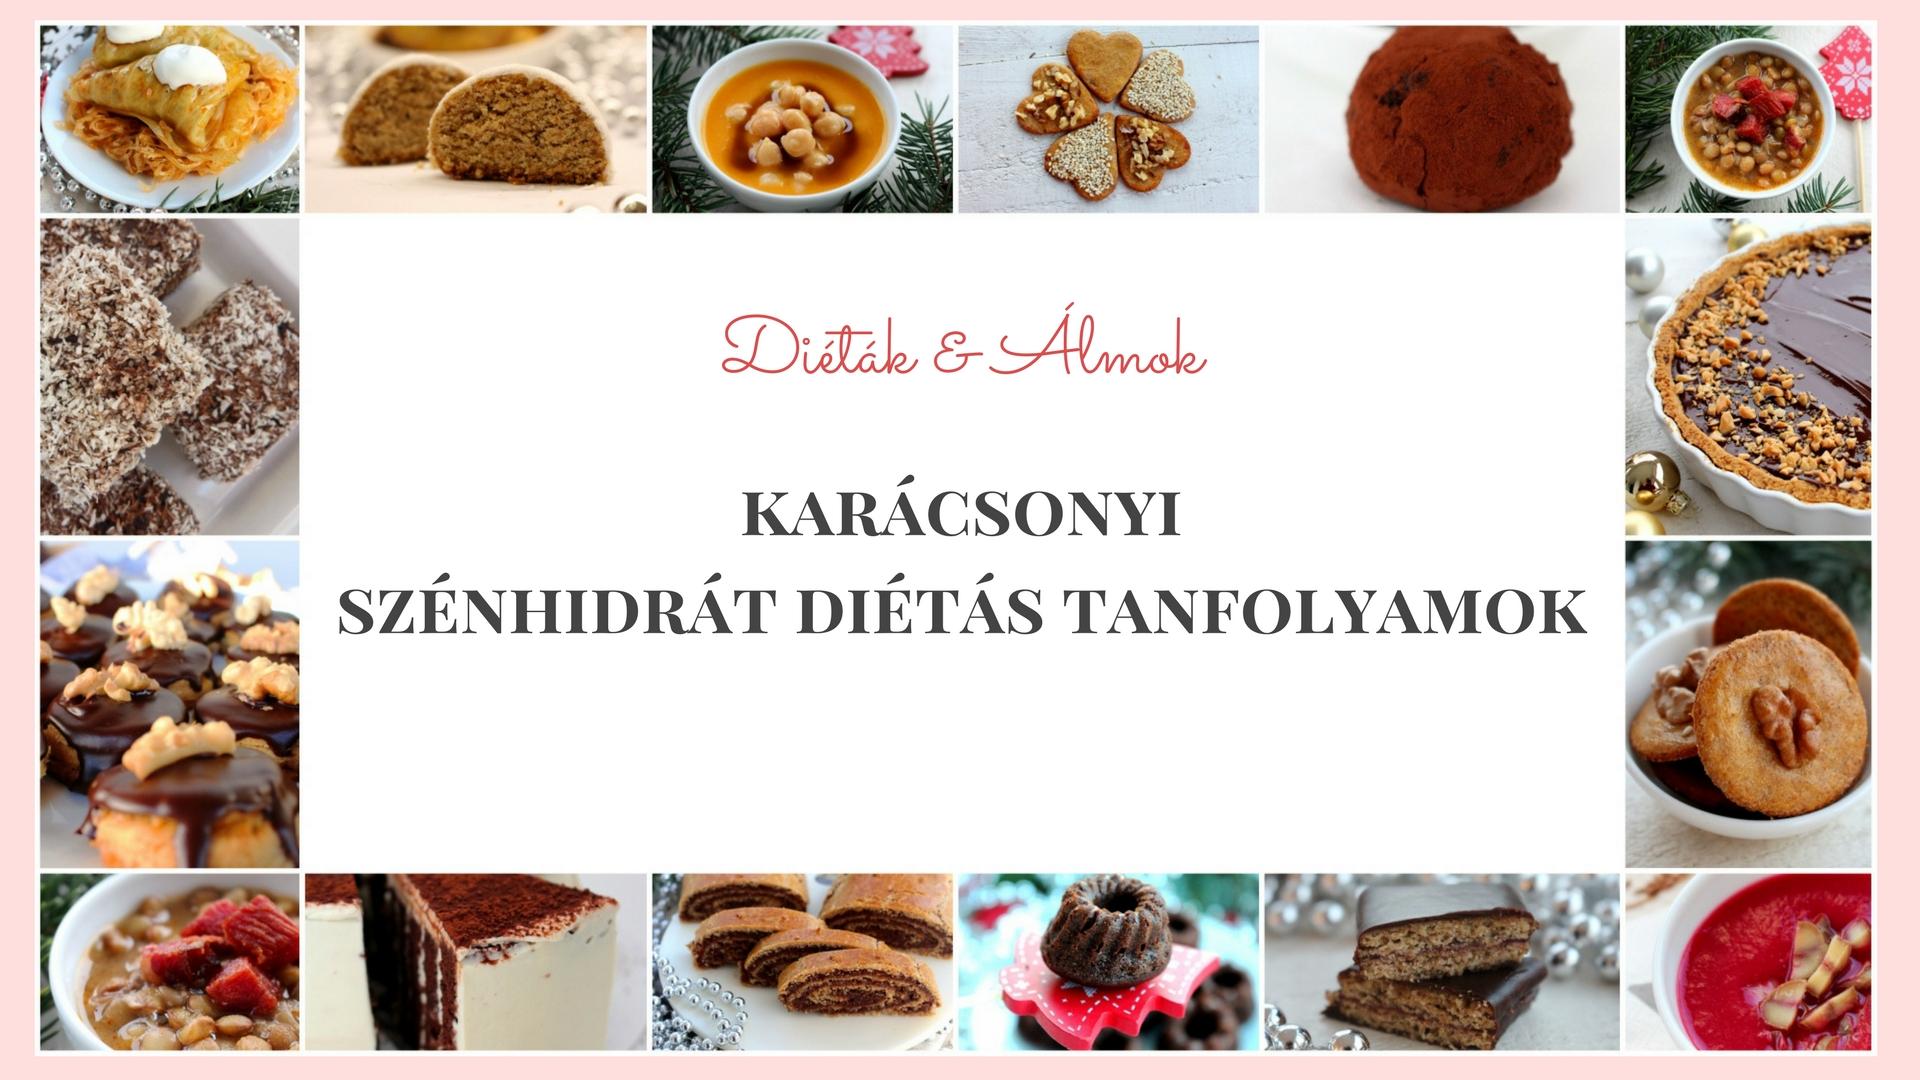 dietak_almok_karacsonyi_szenhidrat_dieta_tanfolyam_2017_1.jpg